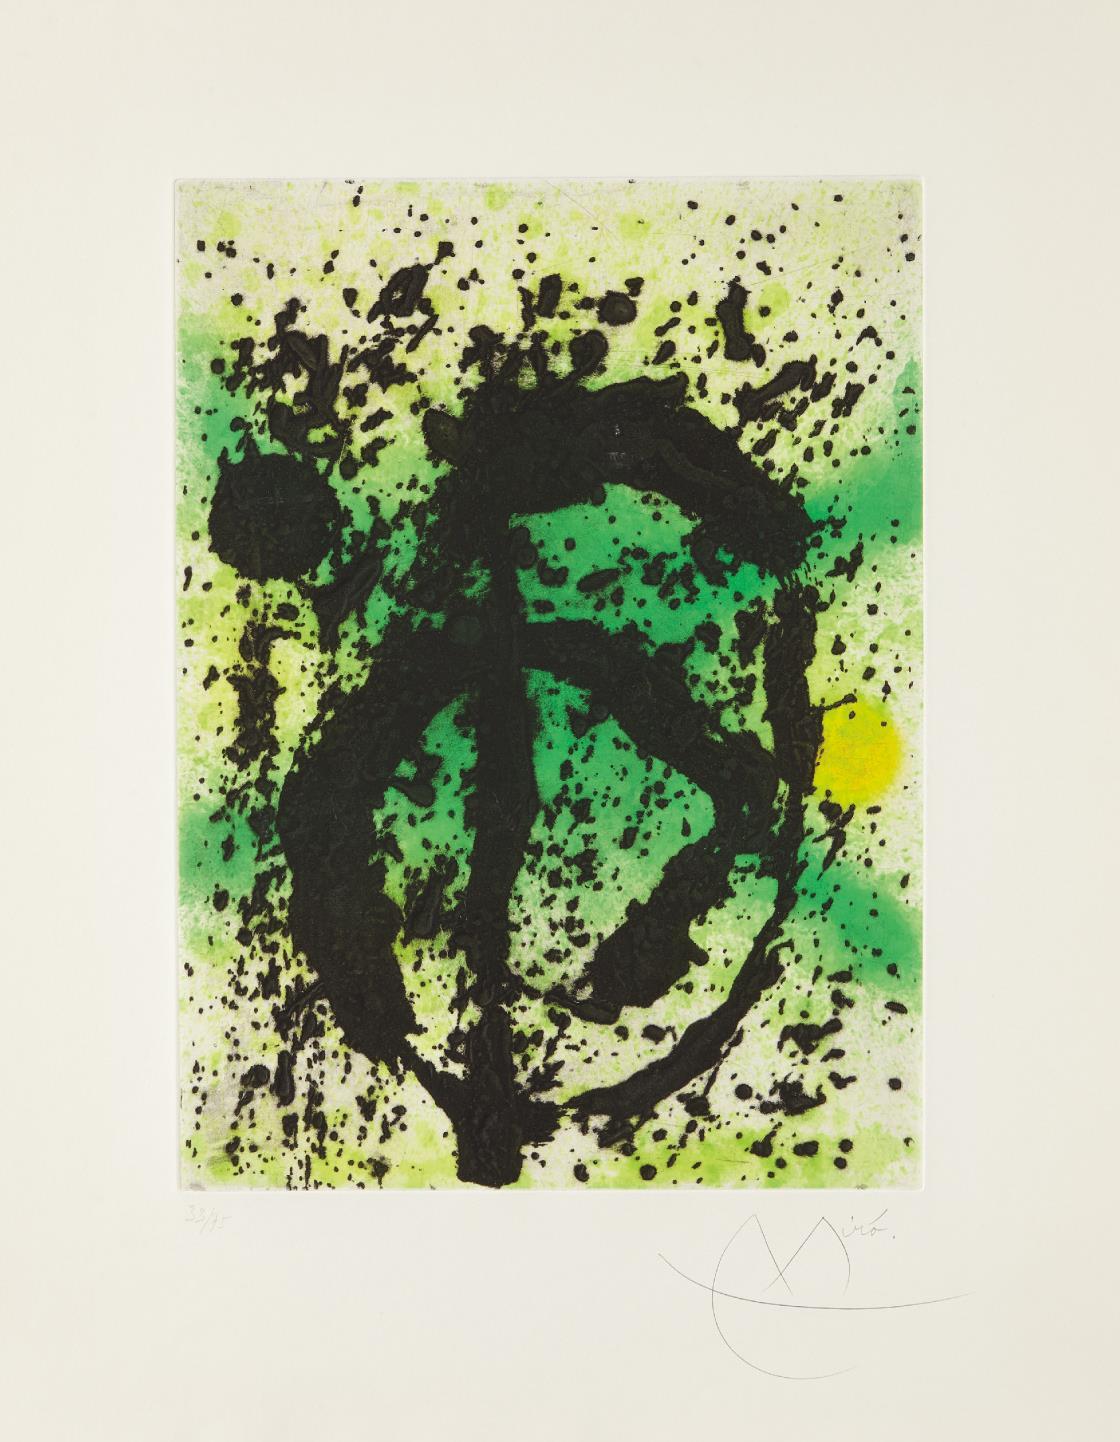 Joan Miro-Regne vegetal (United Plant Kingdom)-1968